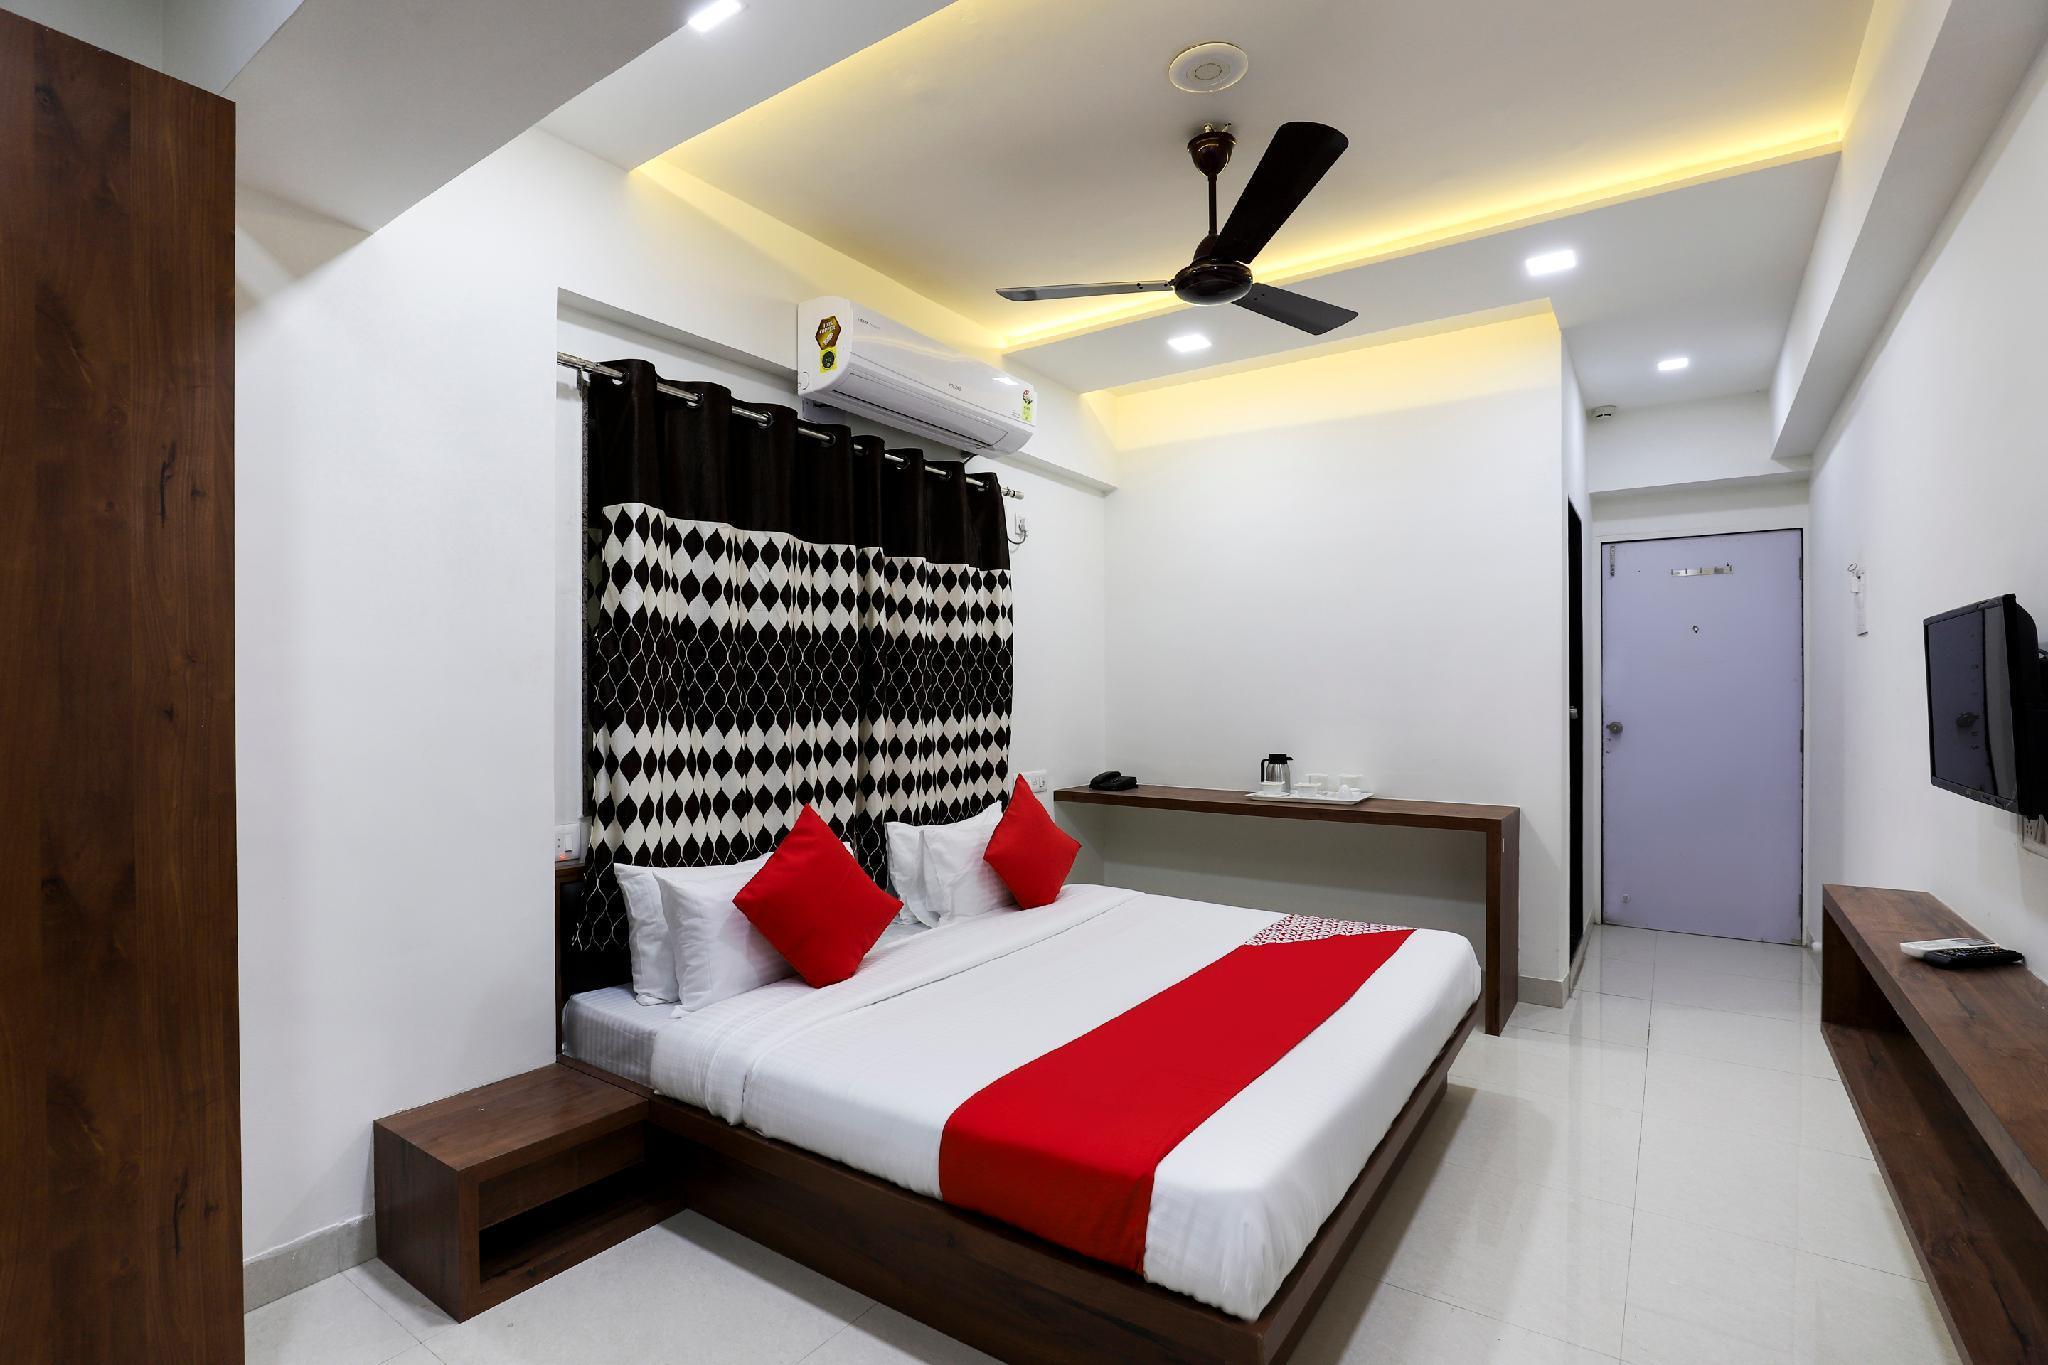 OYO 45011 Sumukh Hotel